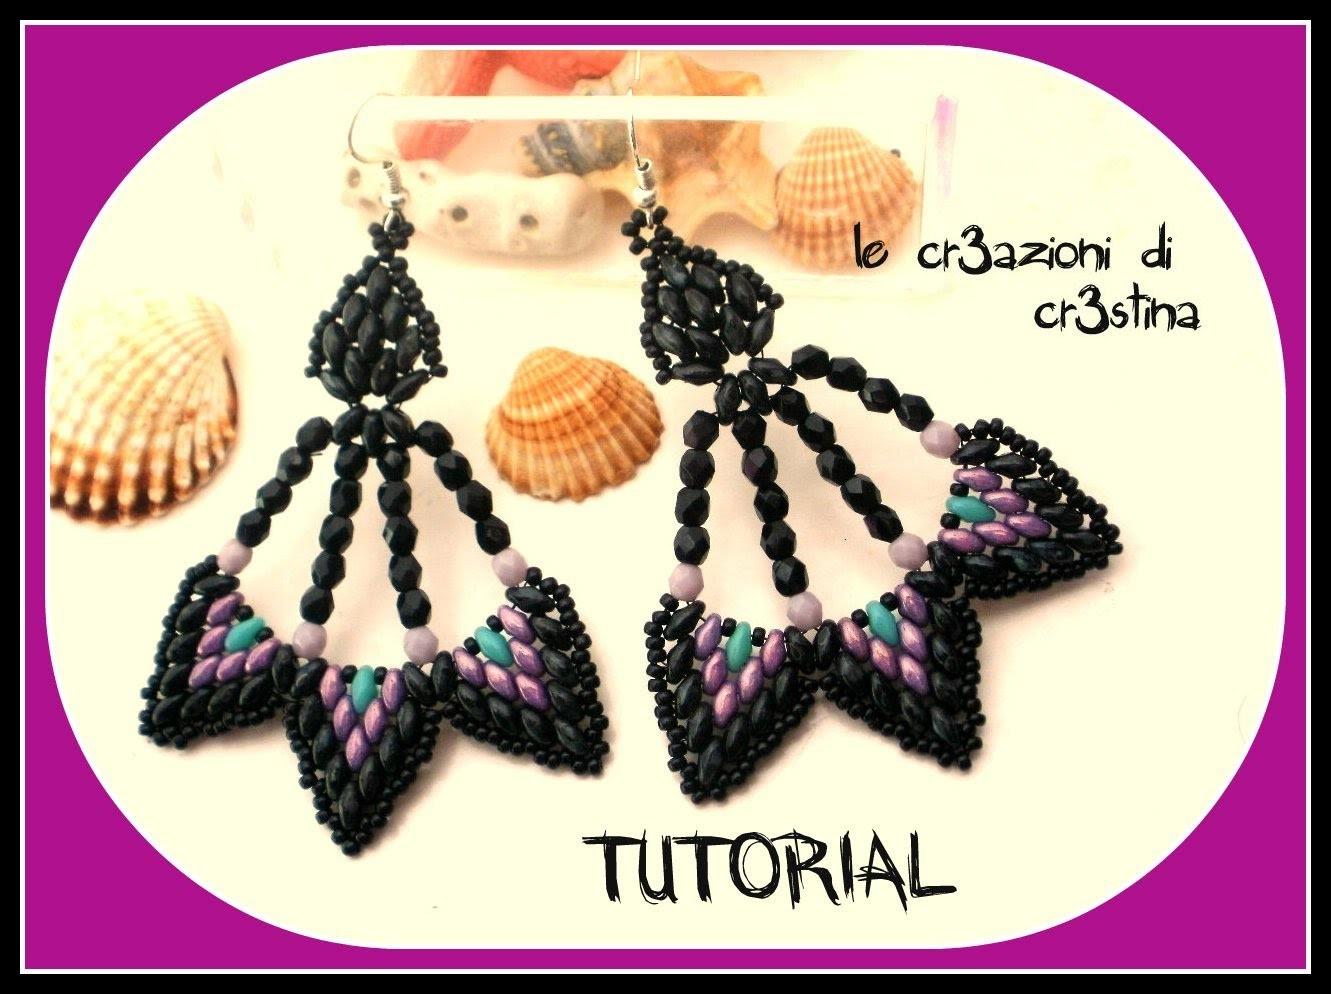 Tutorial Orecchini Peacock con Superduo.Twin Beads, Mezzi Cristalli, Perline Rocailles-DIY earrings